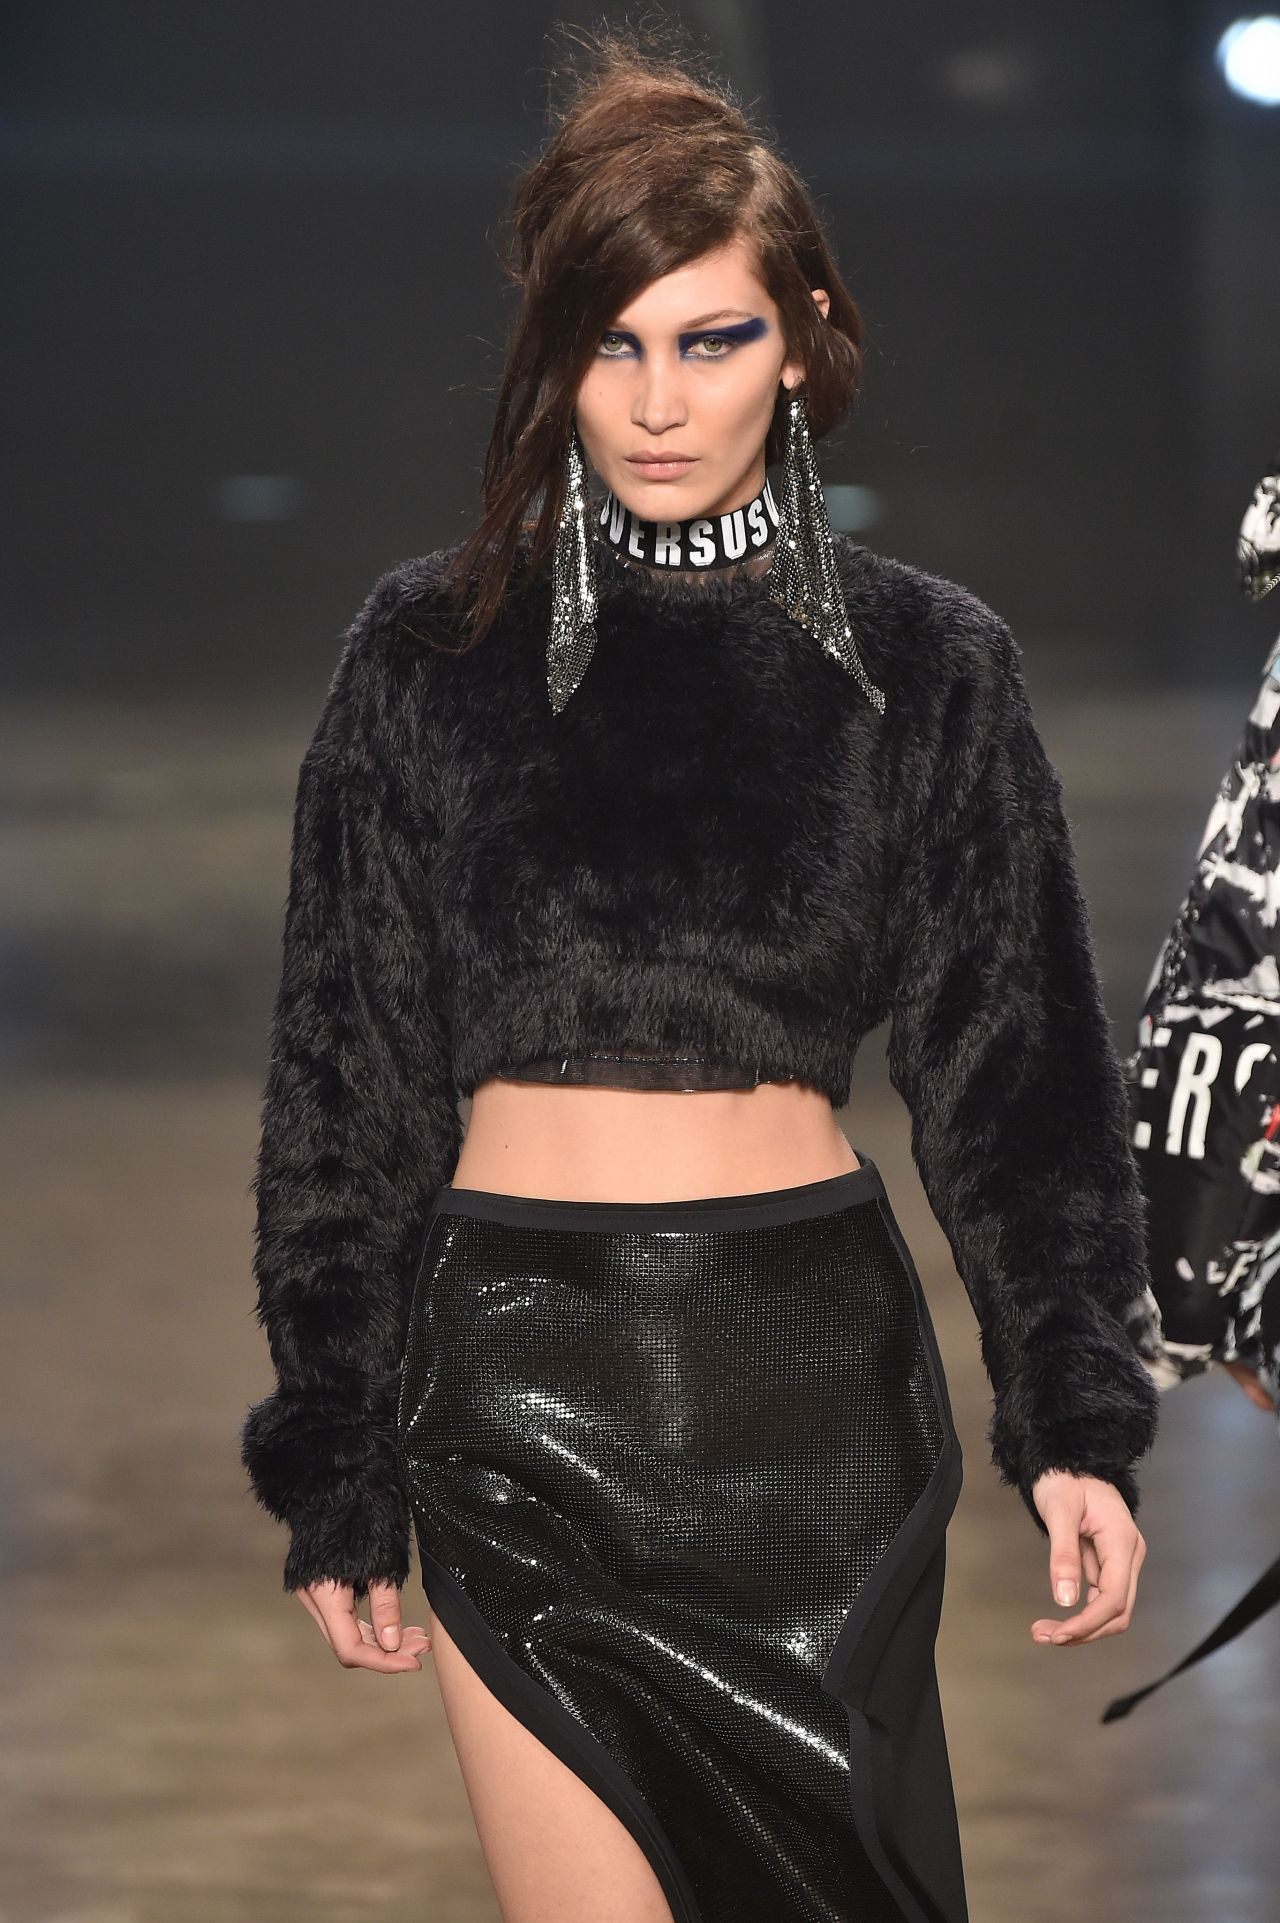 Bella Hadid - VERSUS Fashion Show at London Fashion Week 2/18/ 2017